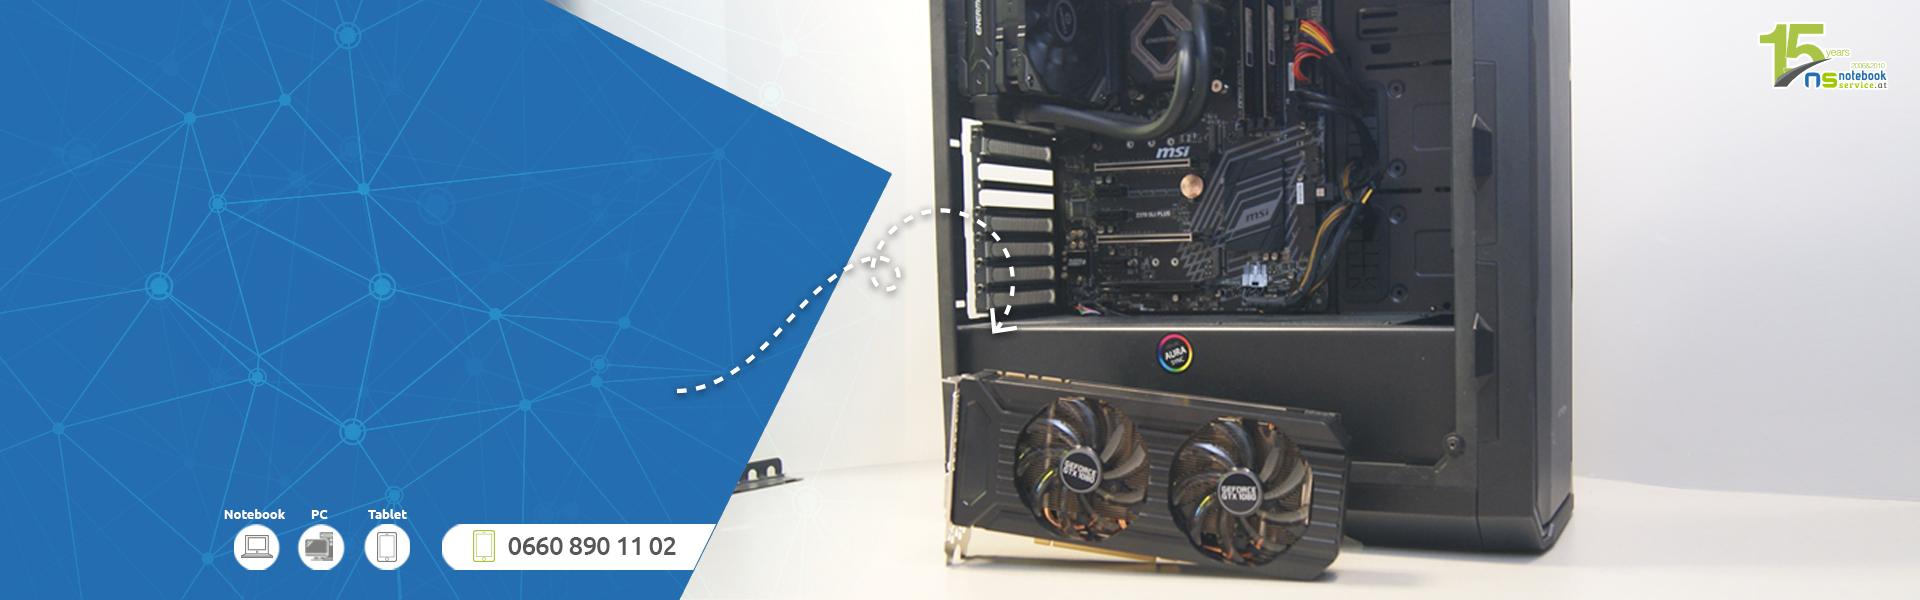 Slider 02 - Computer / PC Service